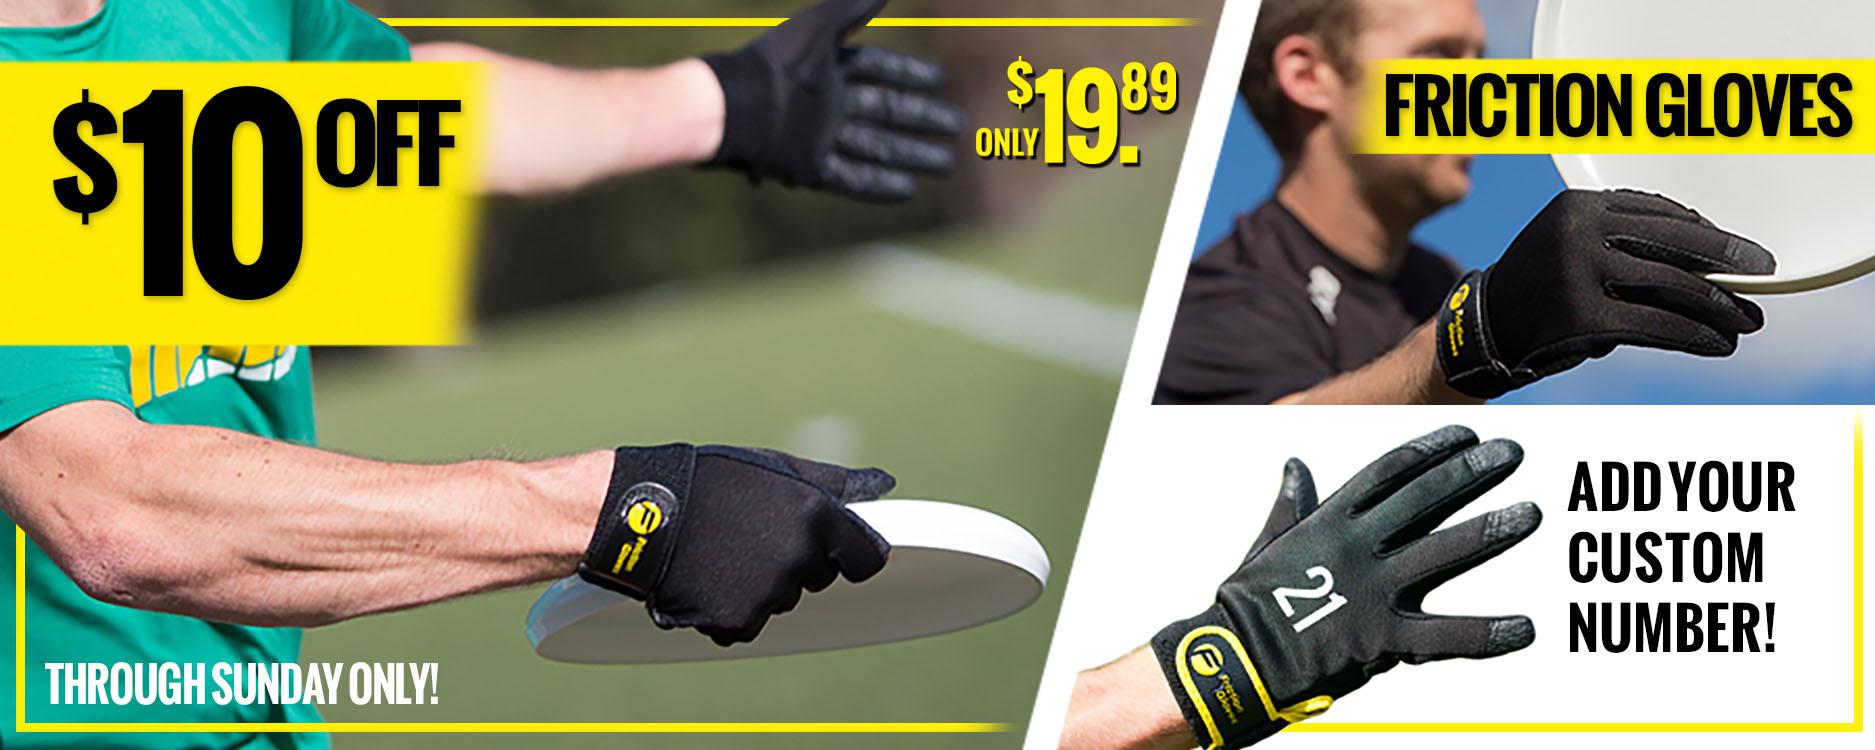 Friction Glove Sale